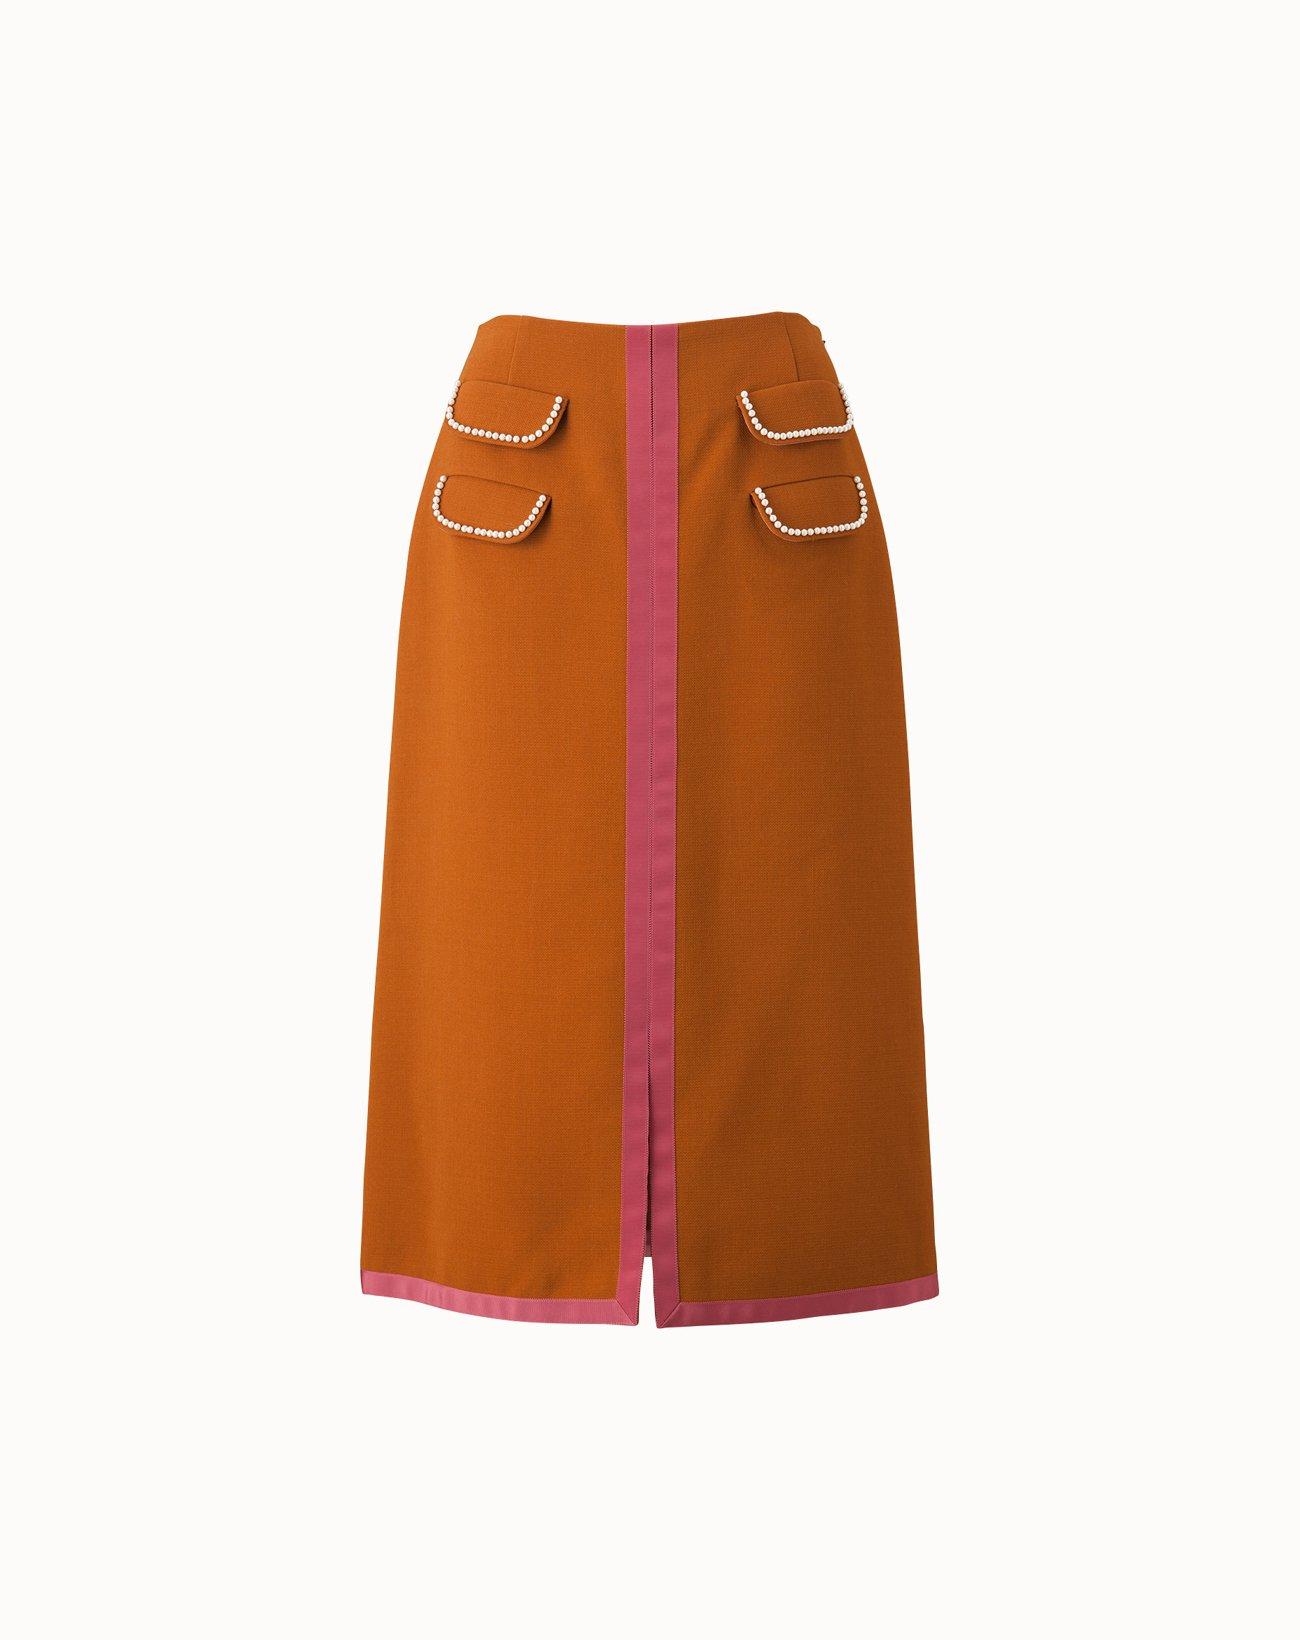 Triple Cloth Skirt - Brown